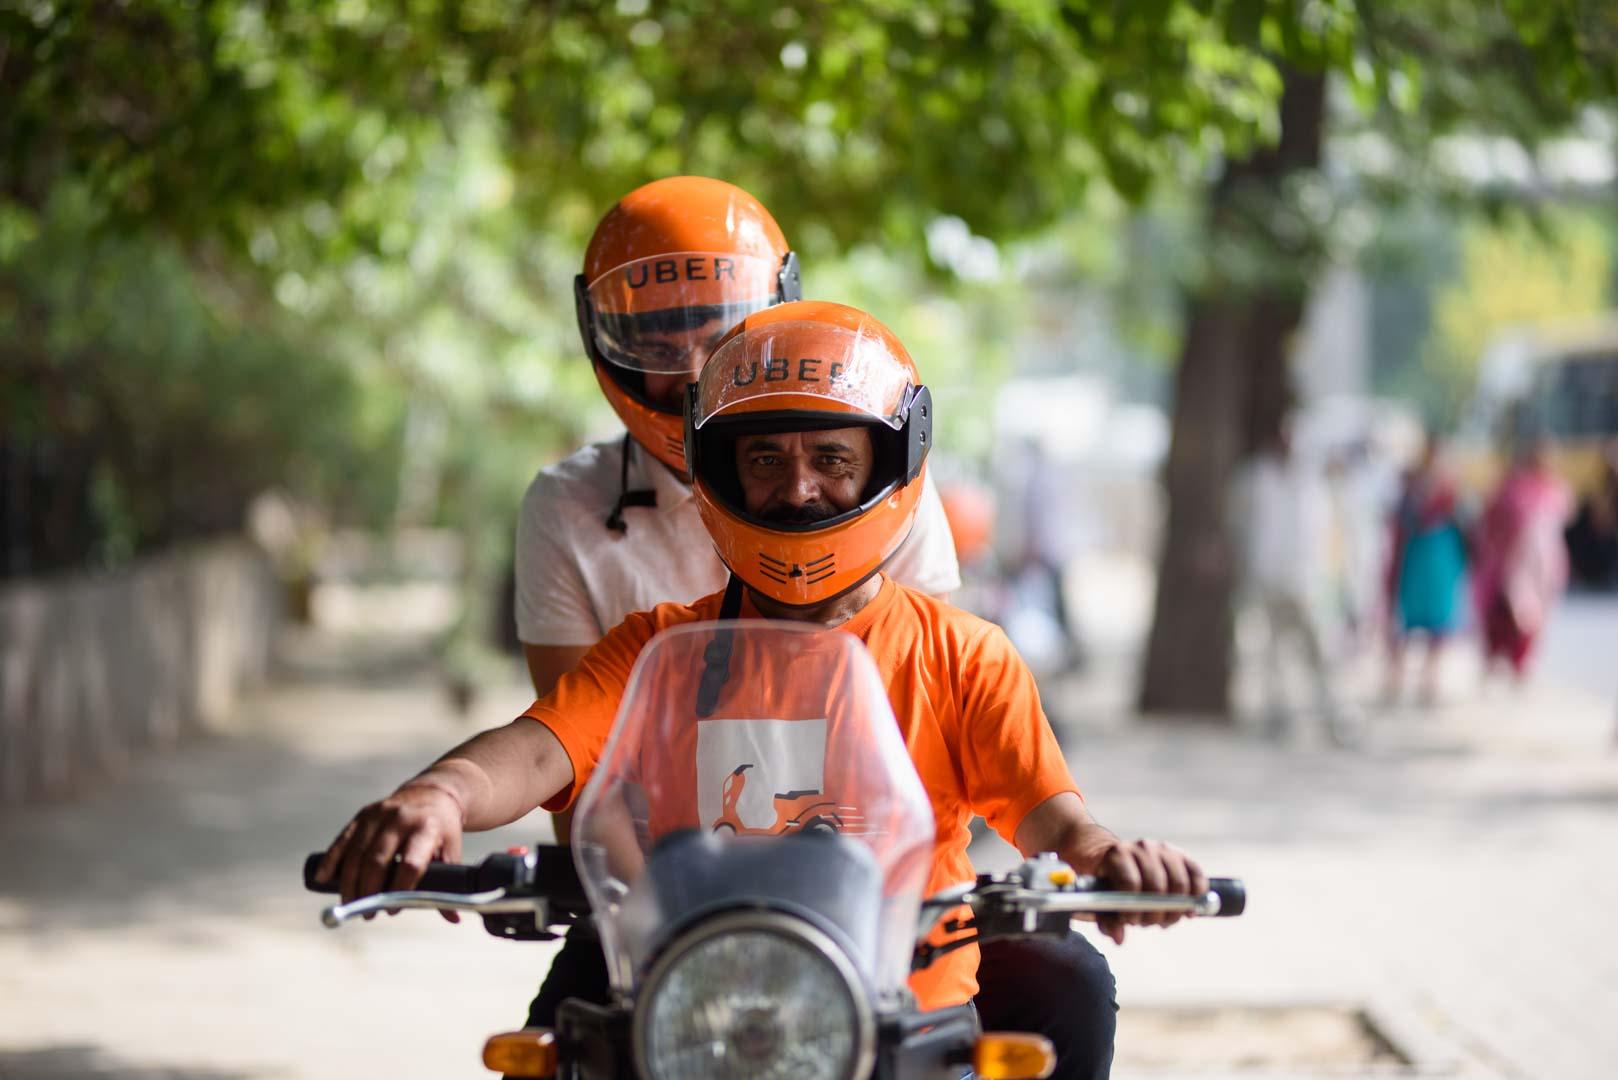 uberMOTO now makes it easy to commute around NCR